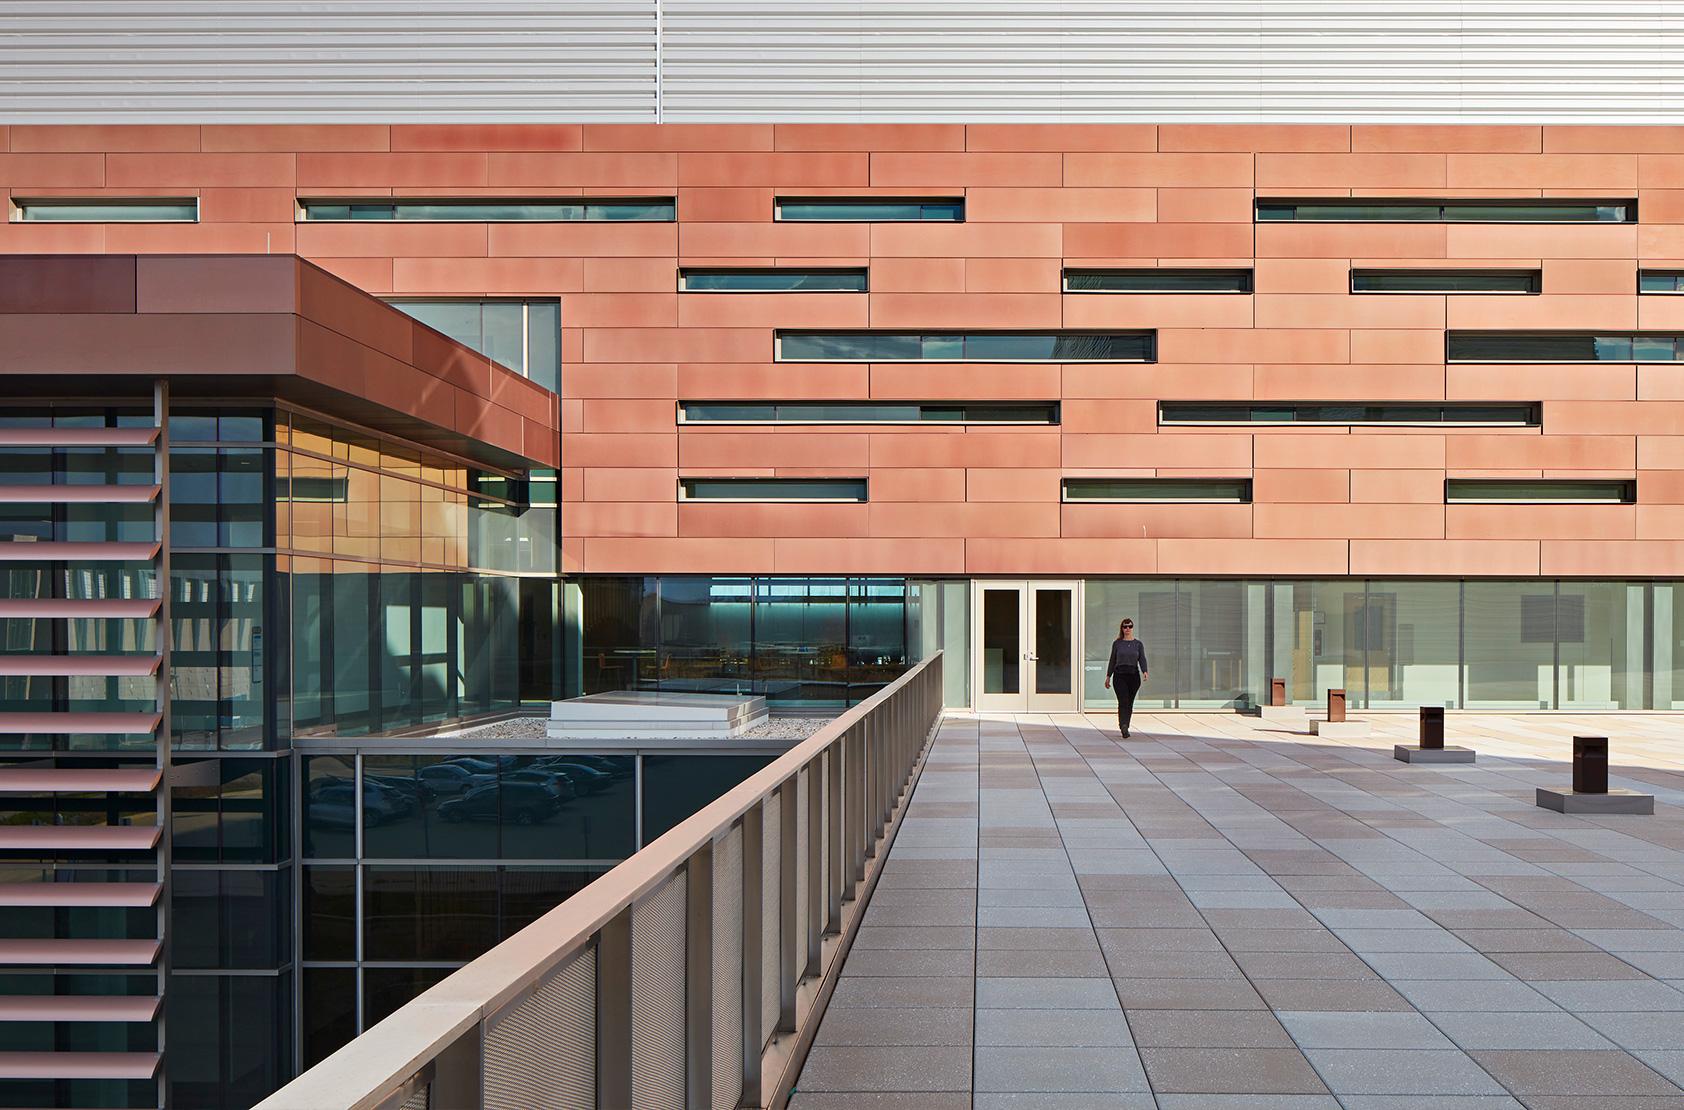 Argonne National Laboratory - Materials Design Laboratory